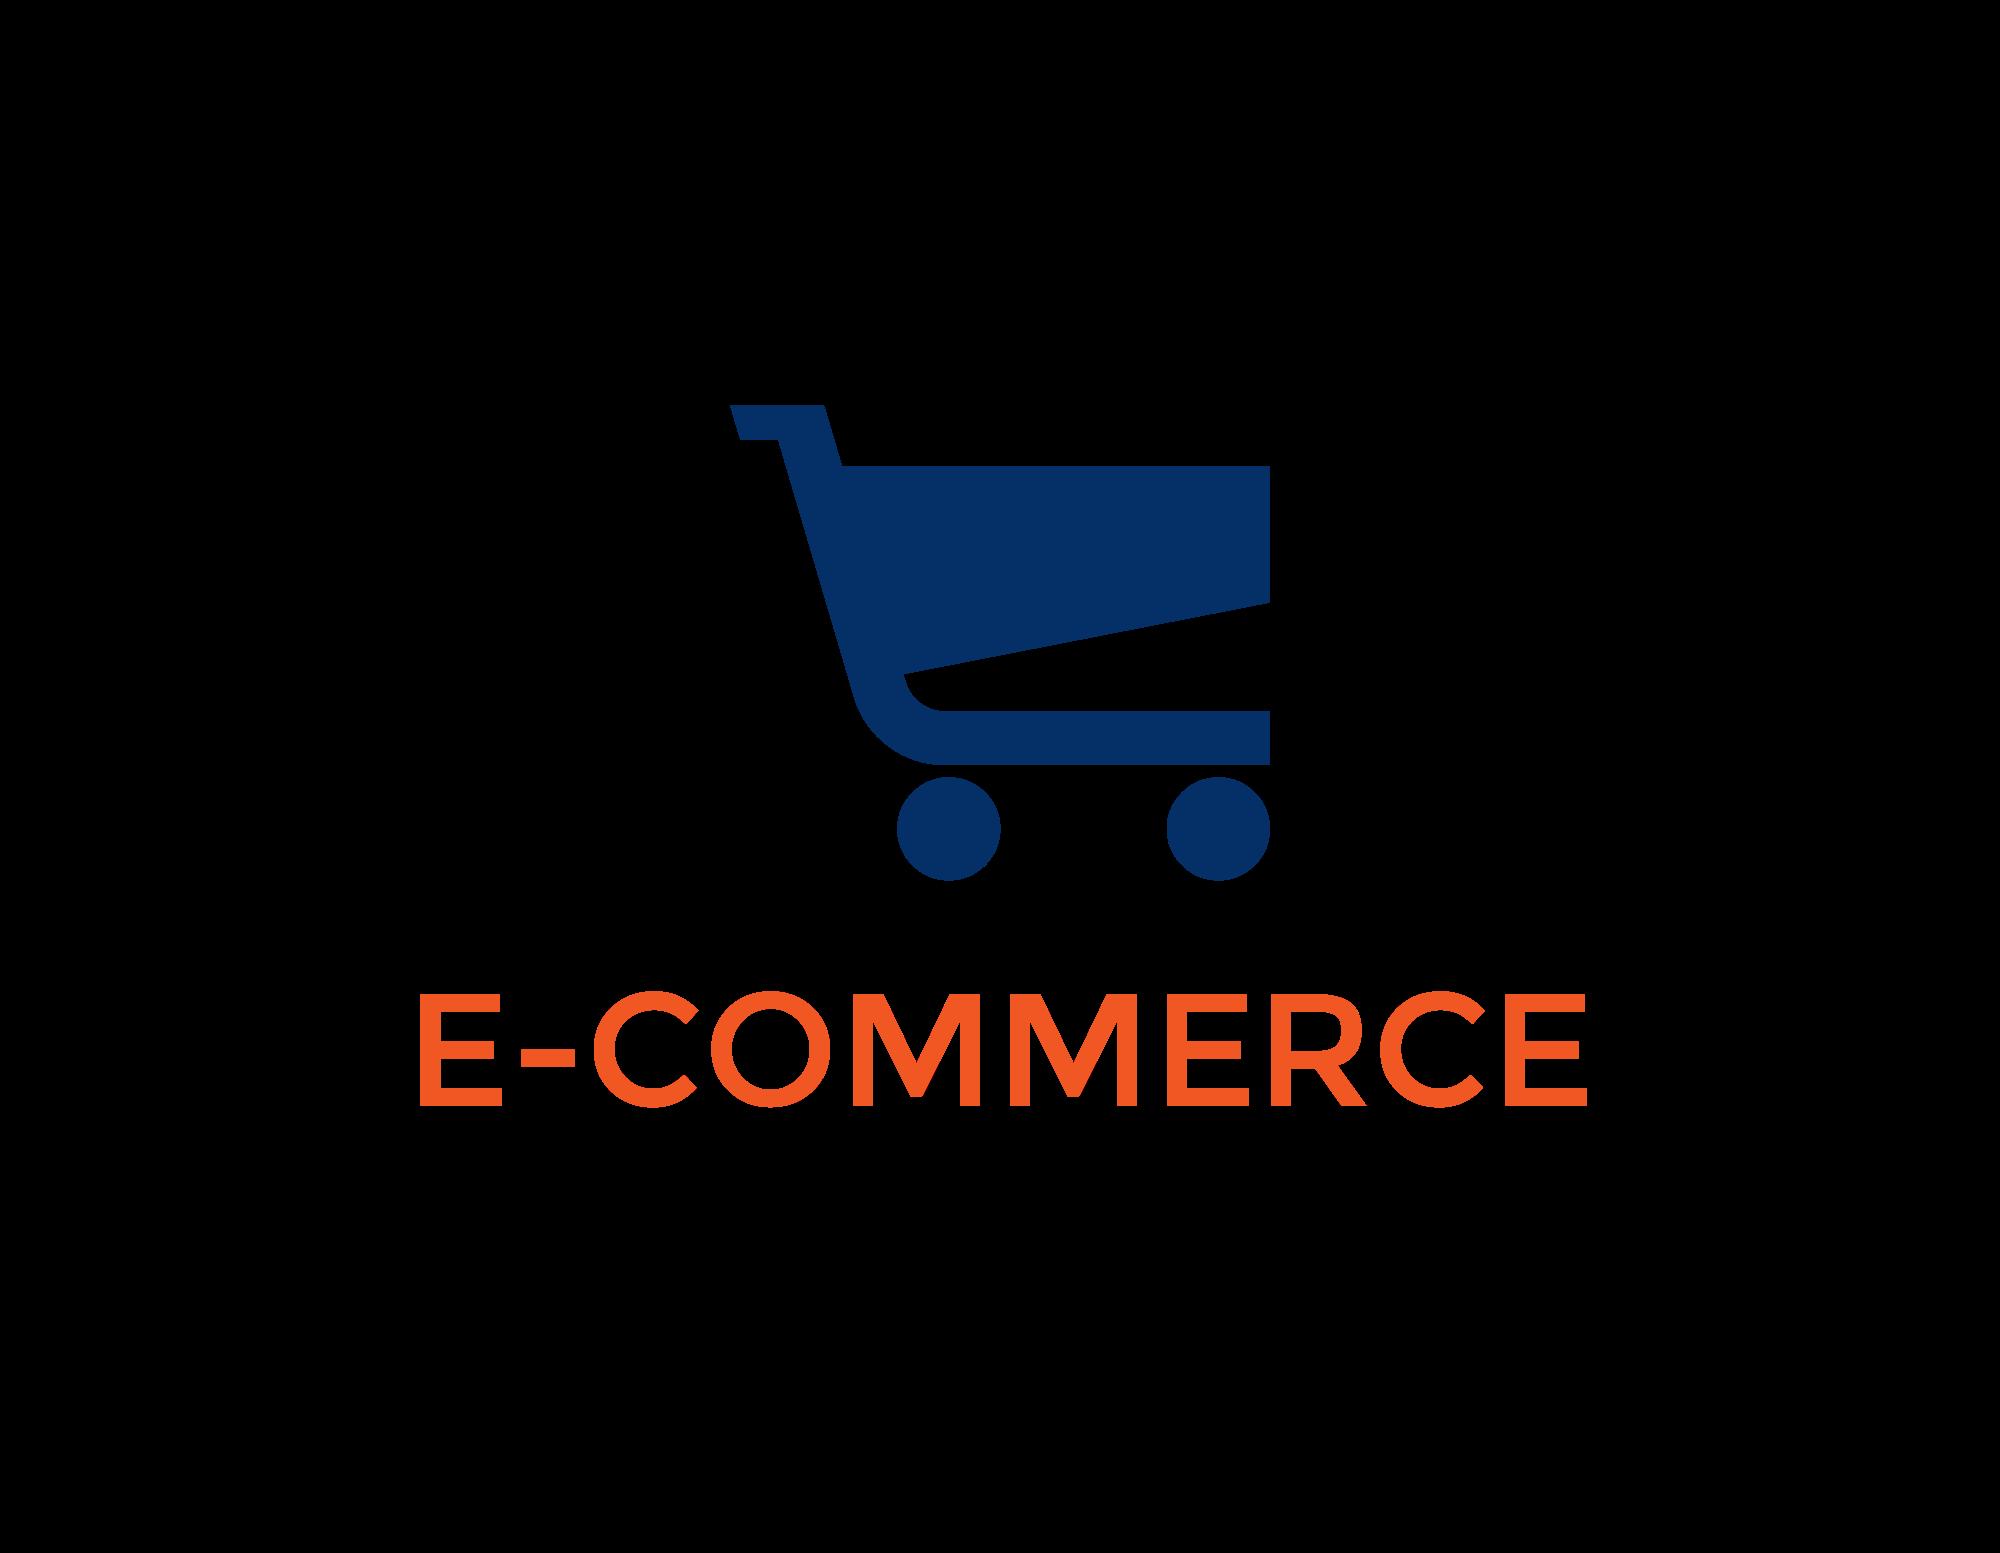 E-COMMERCE-logo.png